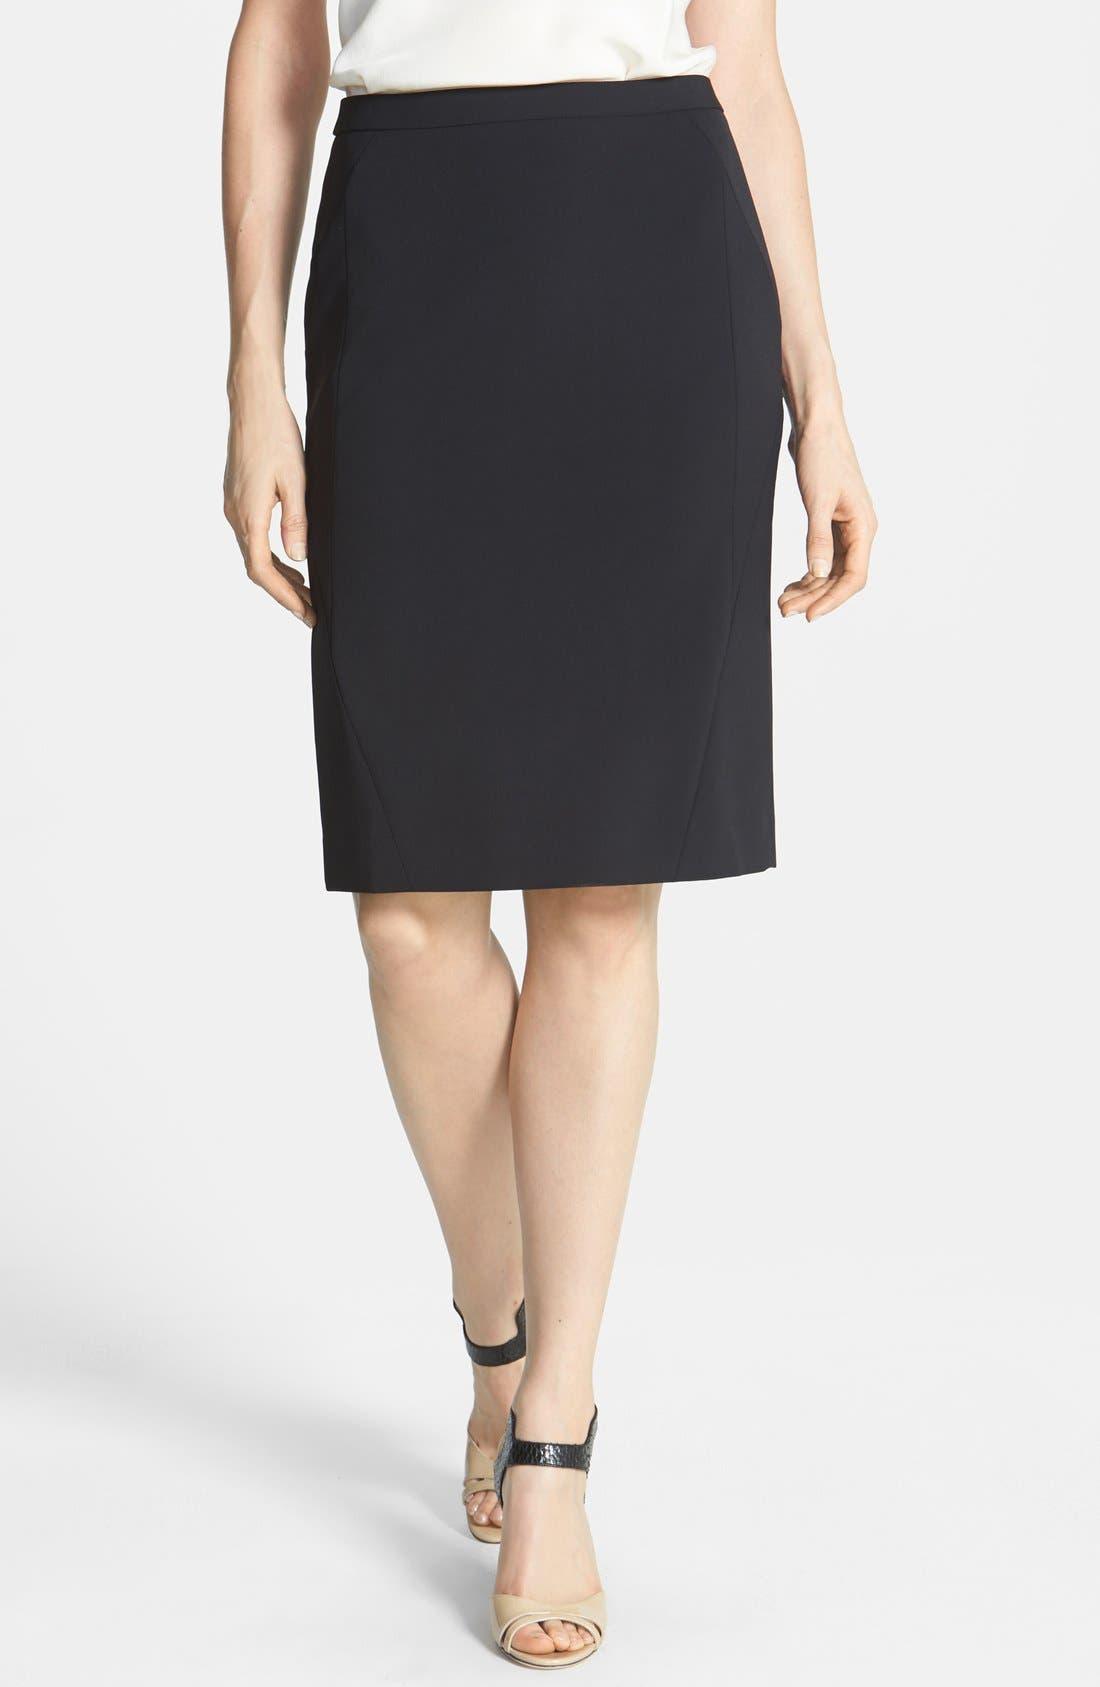 Alternate Image 1 Selected - Classiques Entier® Techno Pencil Skirt